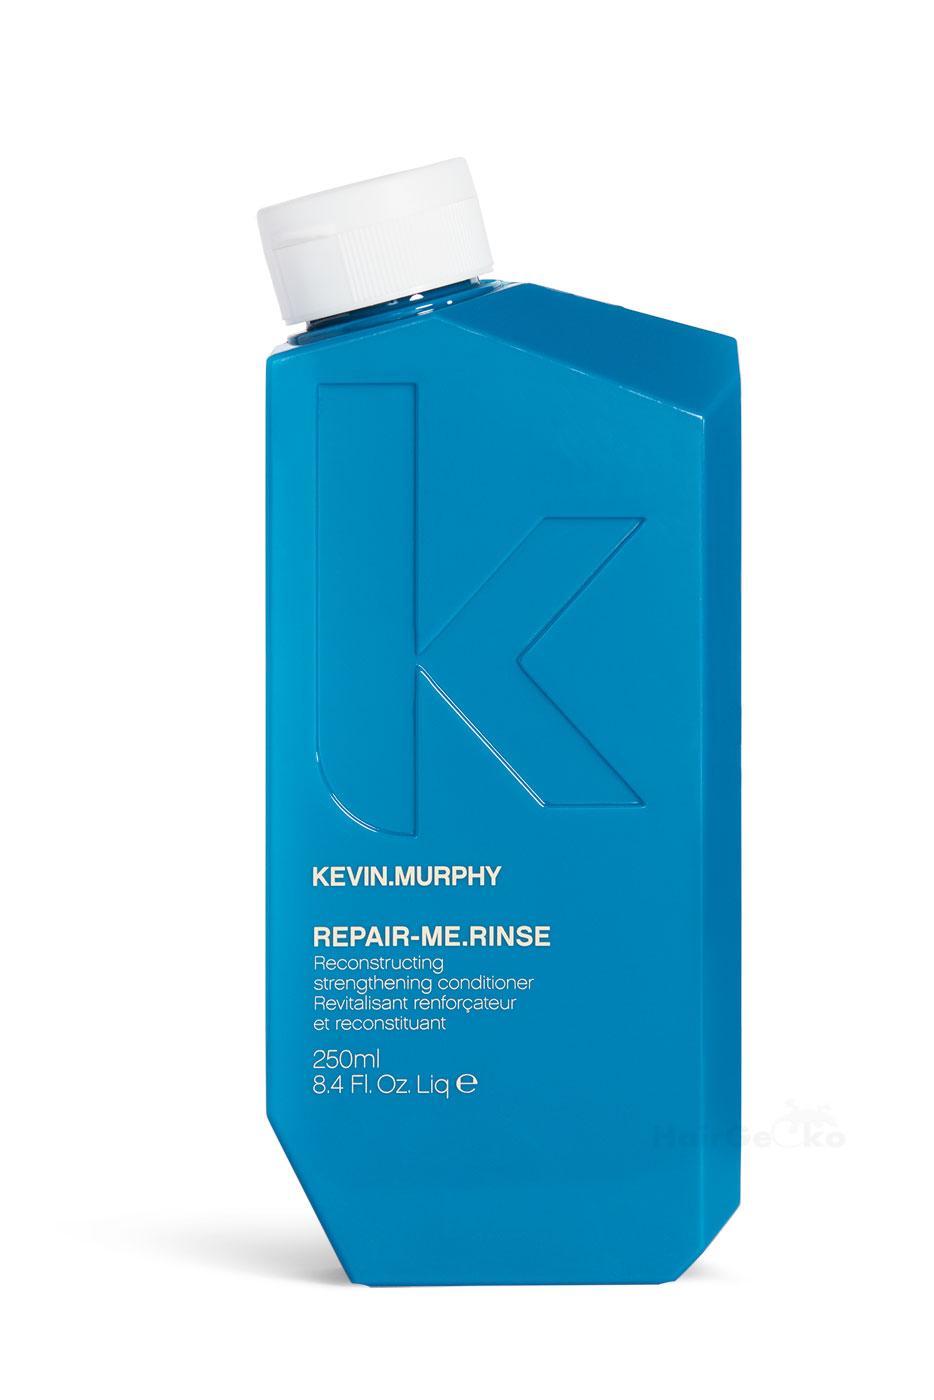 KEVIN.MURPHY REPAIR-ME.RINSE 250 ml